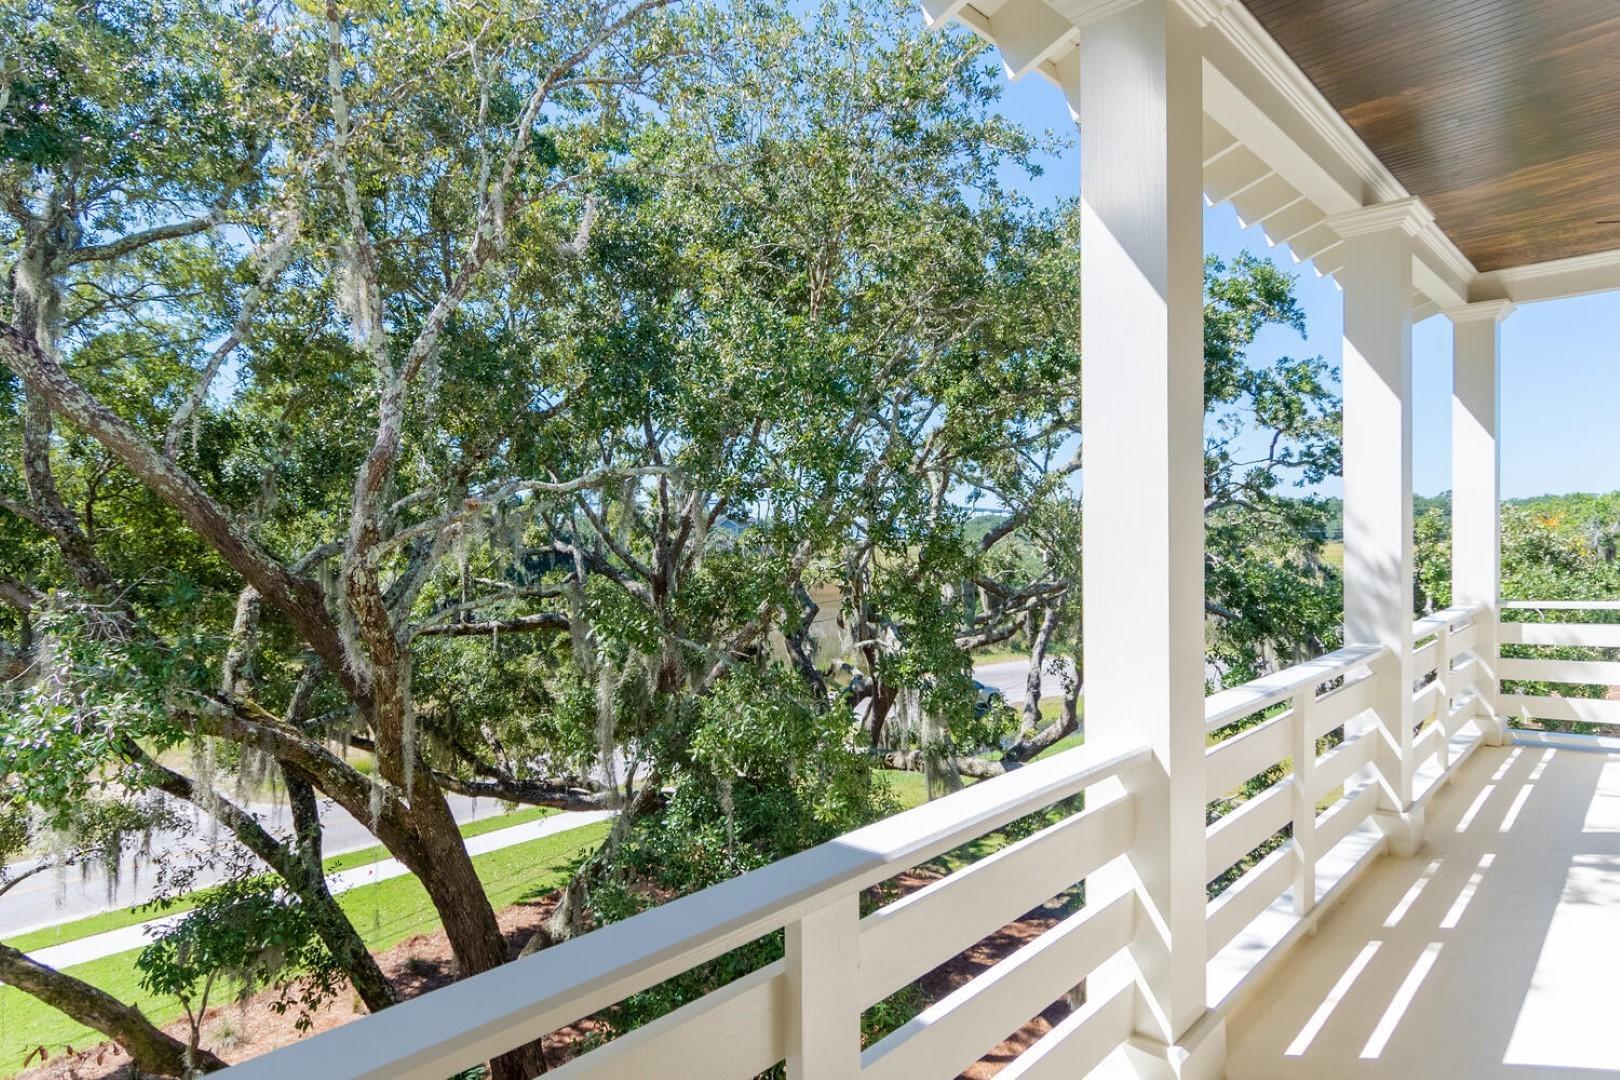 Scanlonville Homes For Sale - 156 5th, Mount Pleasant, SC - 0